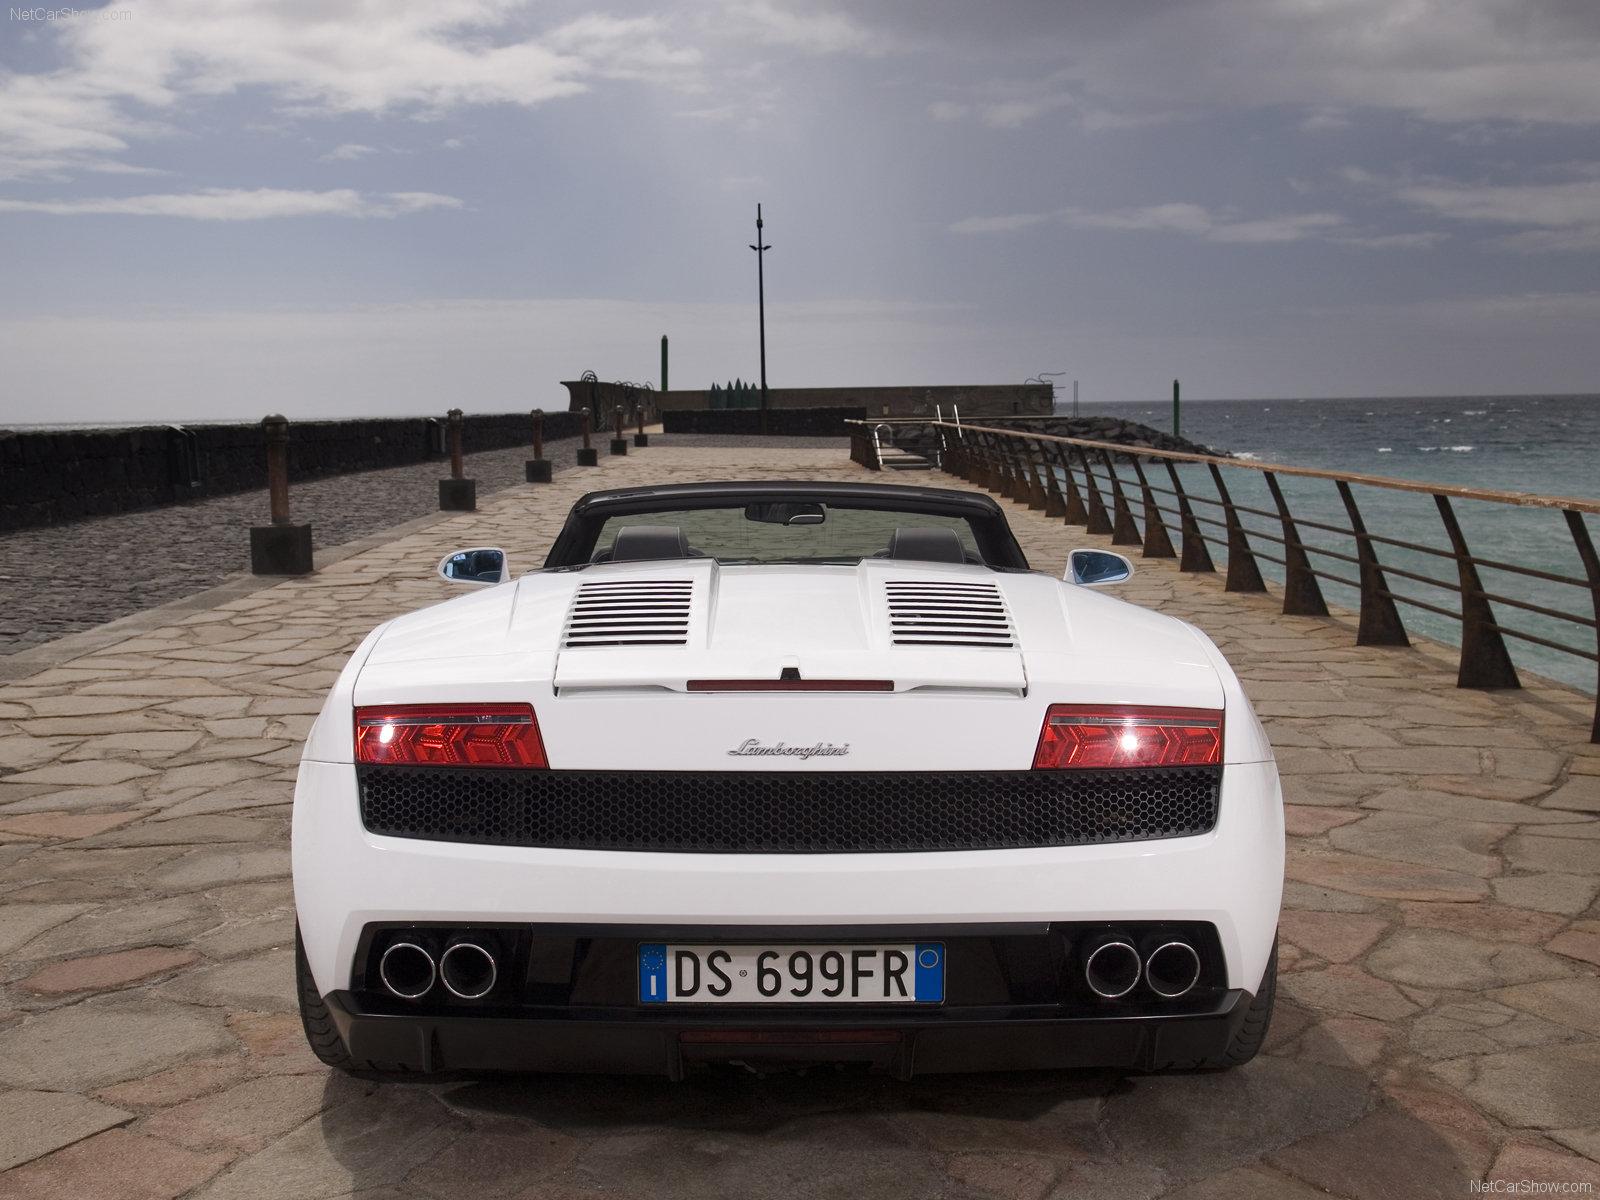 Lamborghini Gallardo Lp560 4 Spyder Picture 65299 Lamborghini